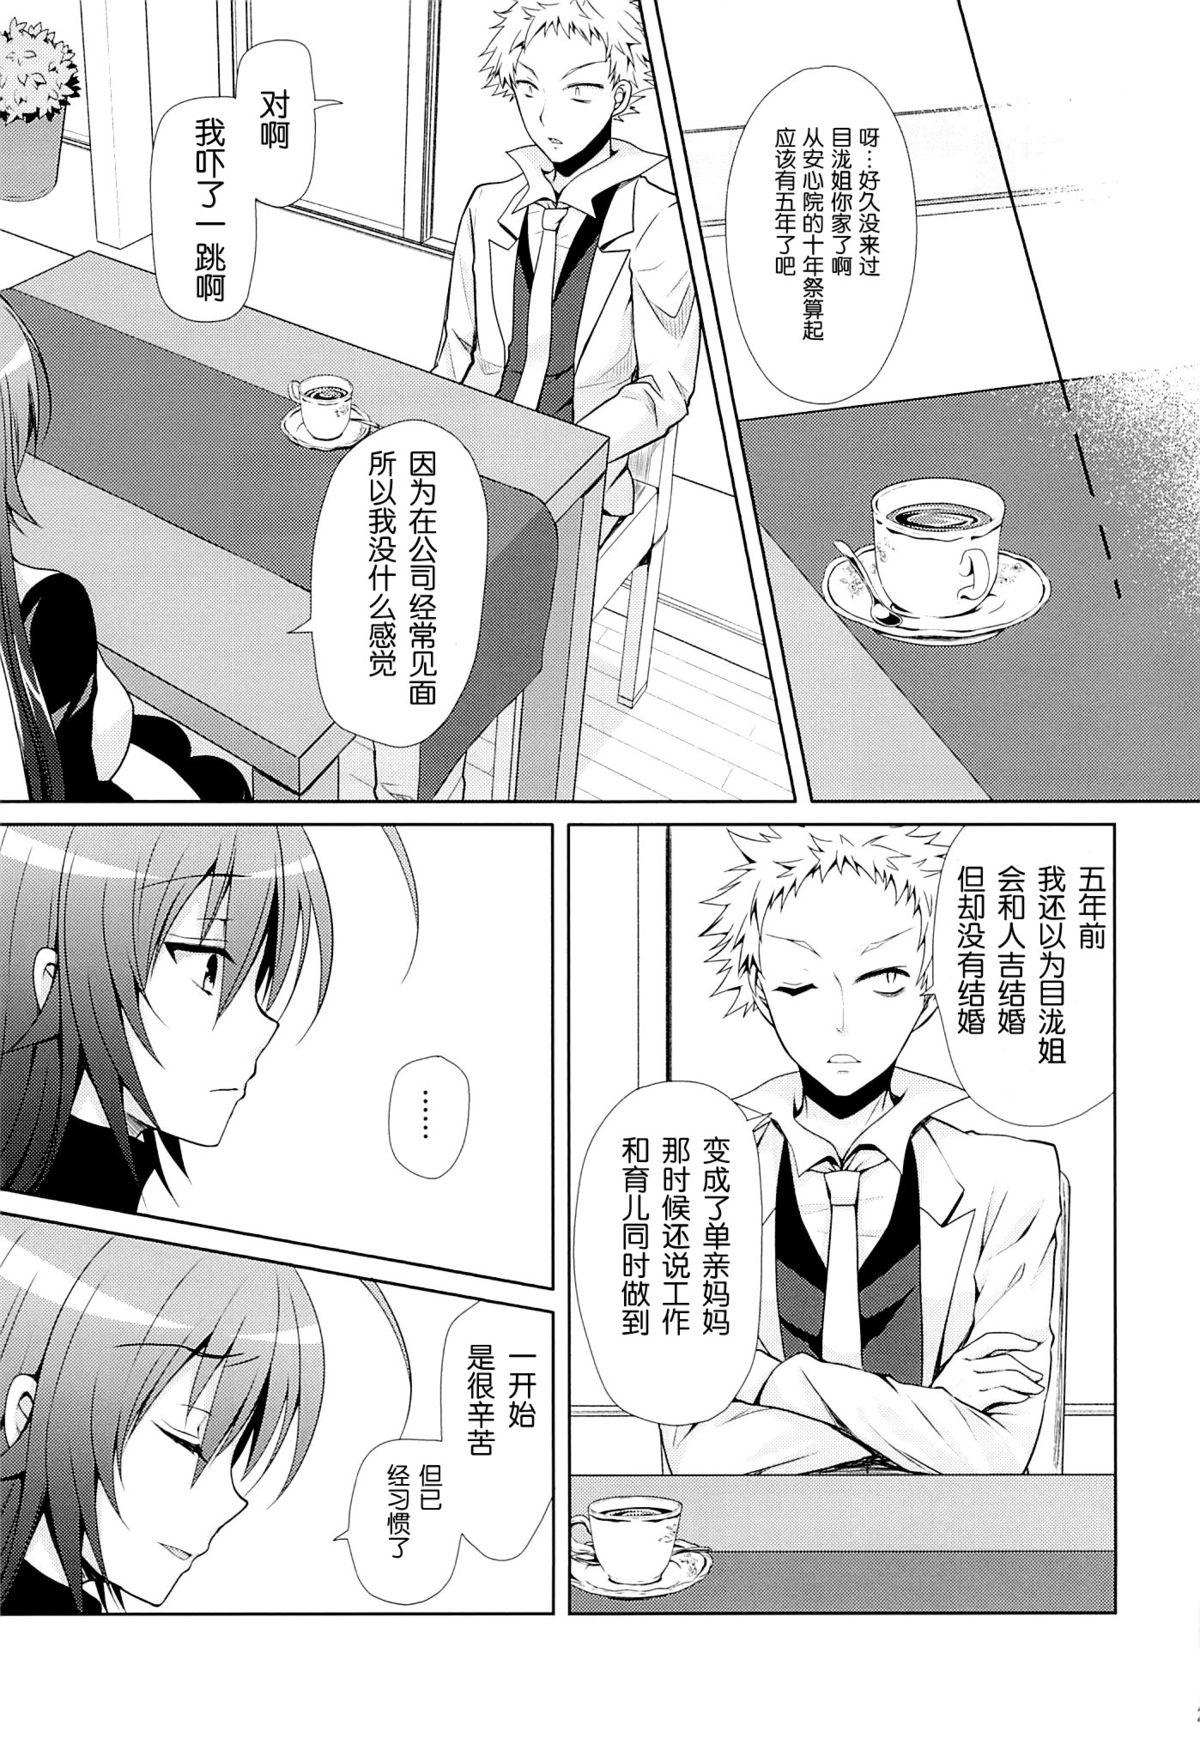 (C87) [Sugar*Berry*Syrup (Kuroe)] Hitozuma Medaka-chan (26) ga Kumagawa-kun ni NTR-reru Hon (Medaka Box) [Chinese] [脸肿汉化组] 26